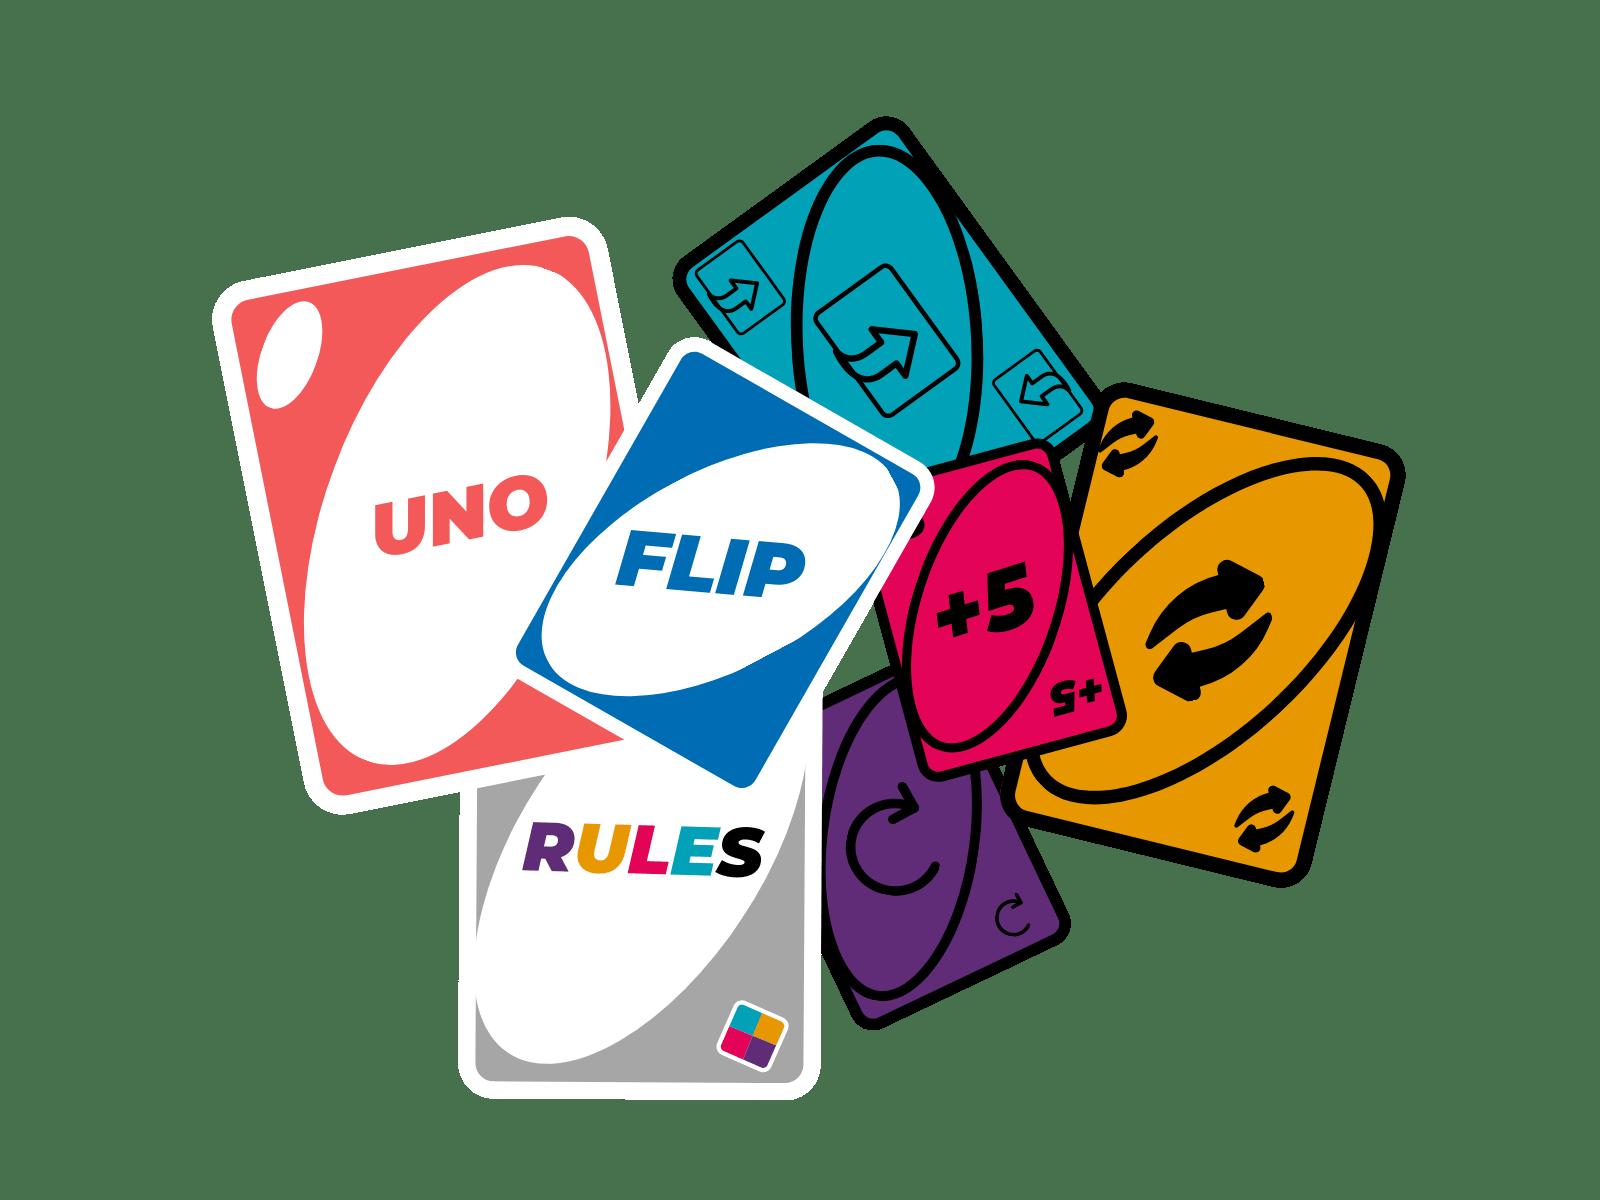 Uno Flip Rules - UnoRules